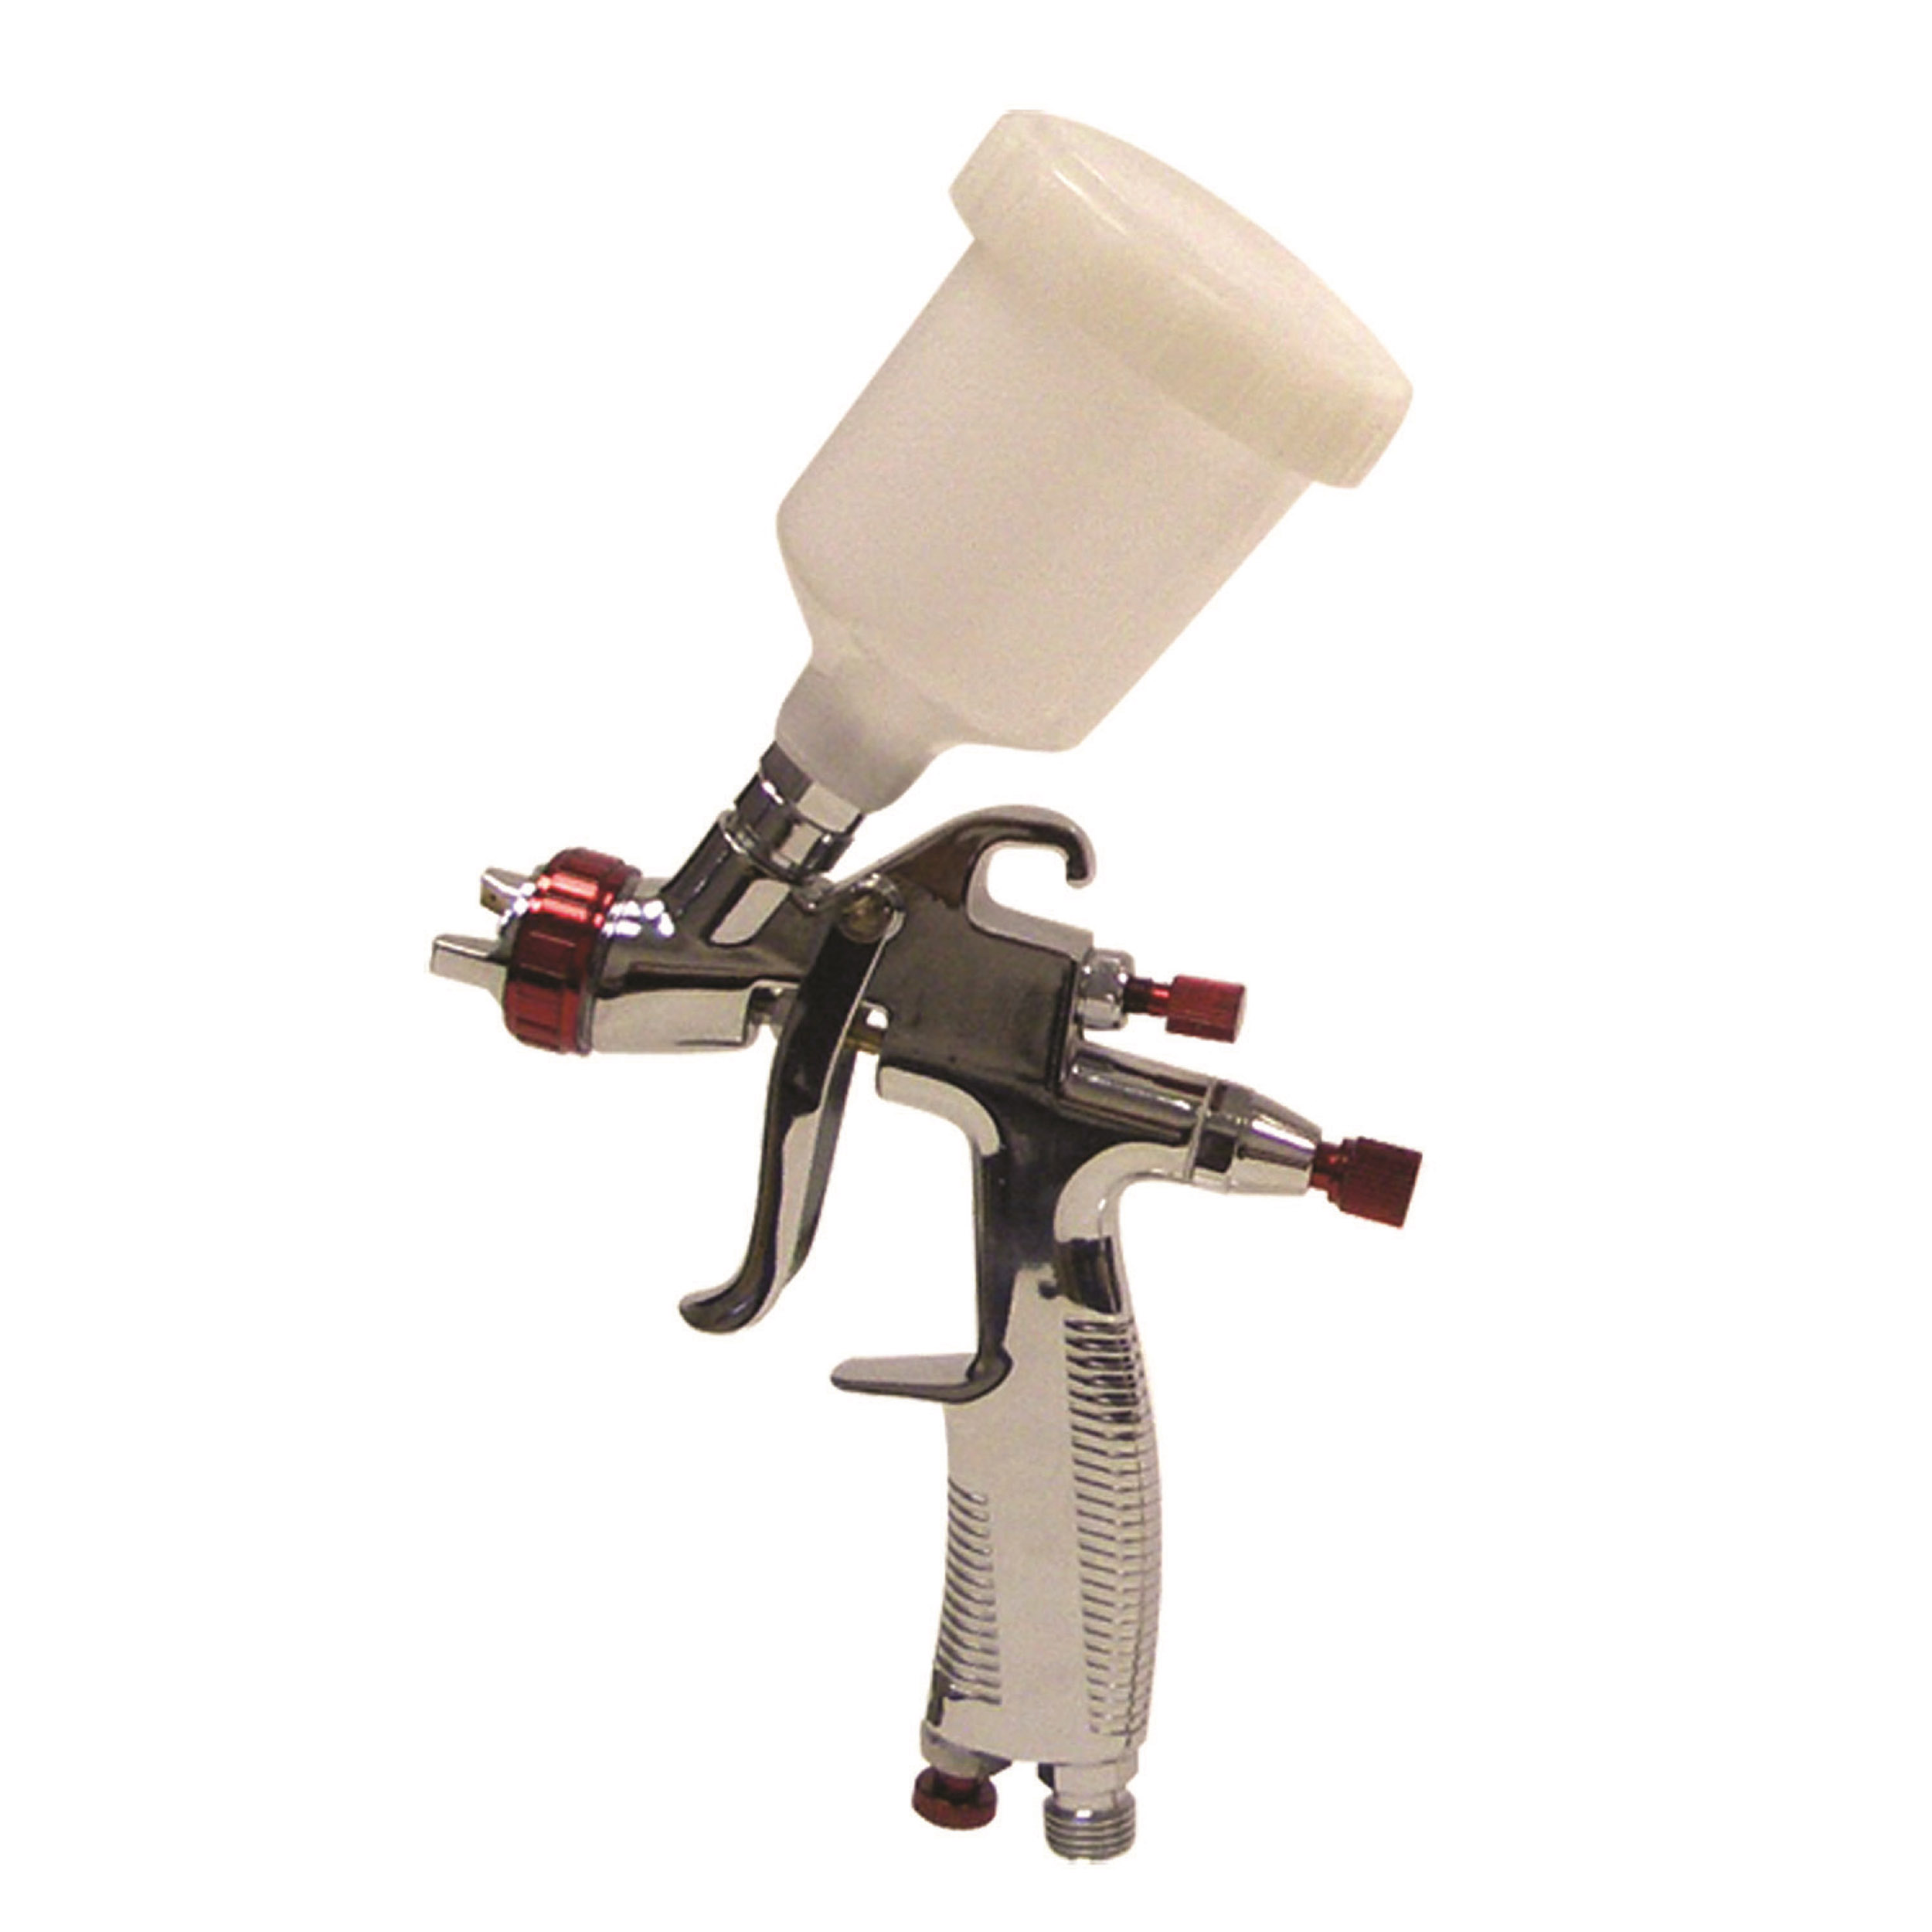 SP-33500 LVLP Mini Gravity Feed Spray Gun